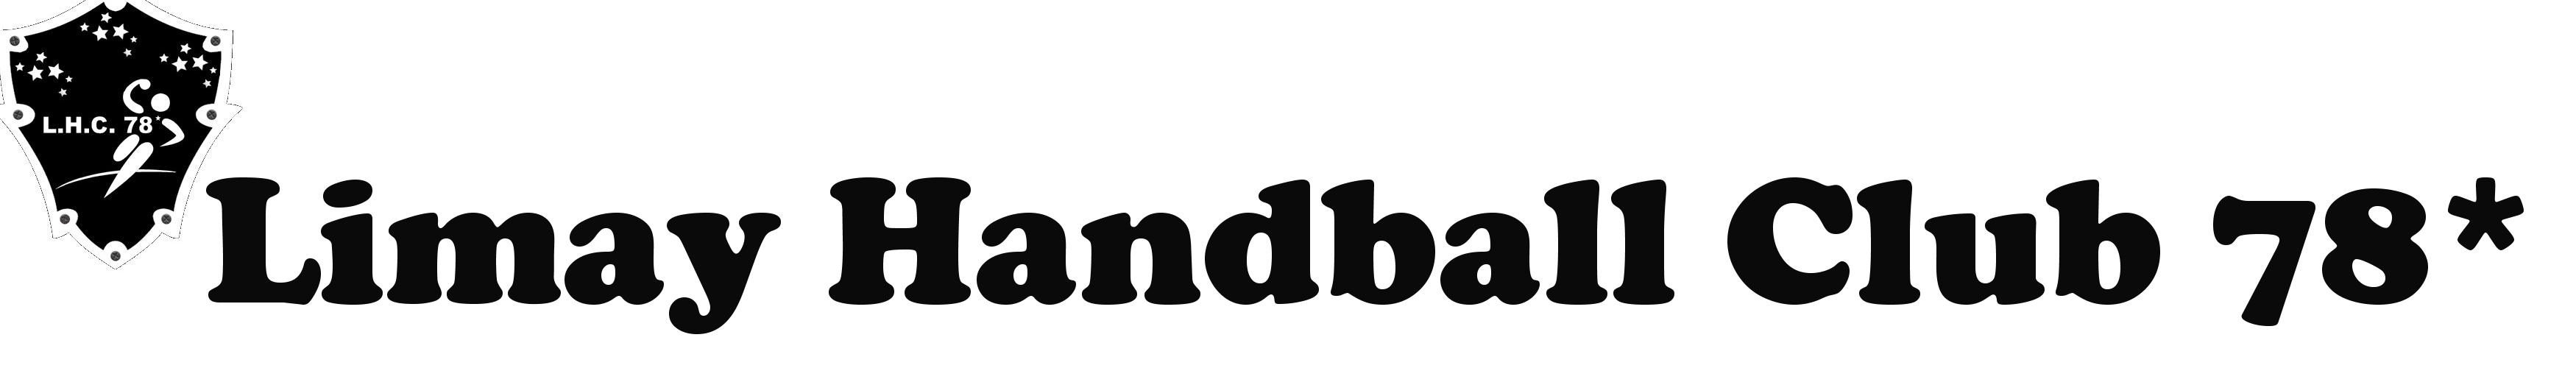 Limay Handball Club 78*